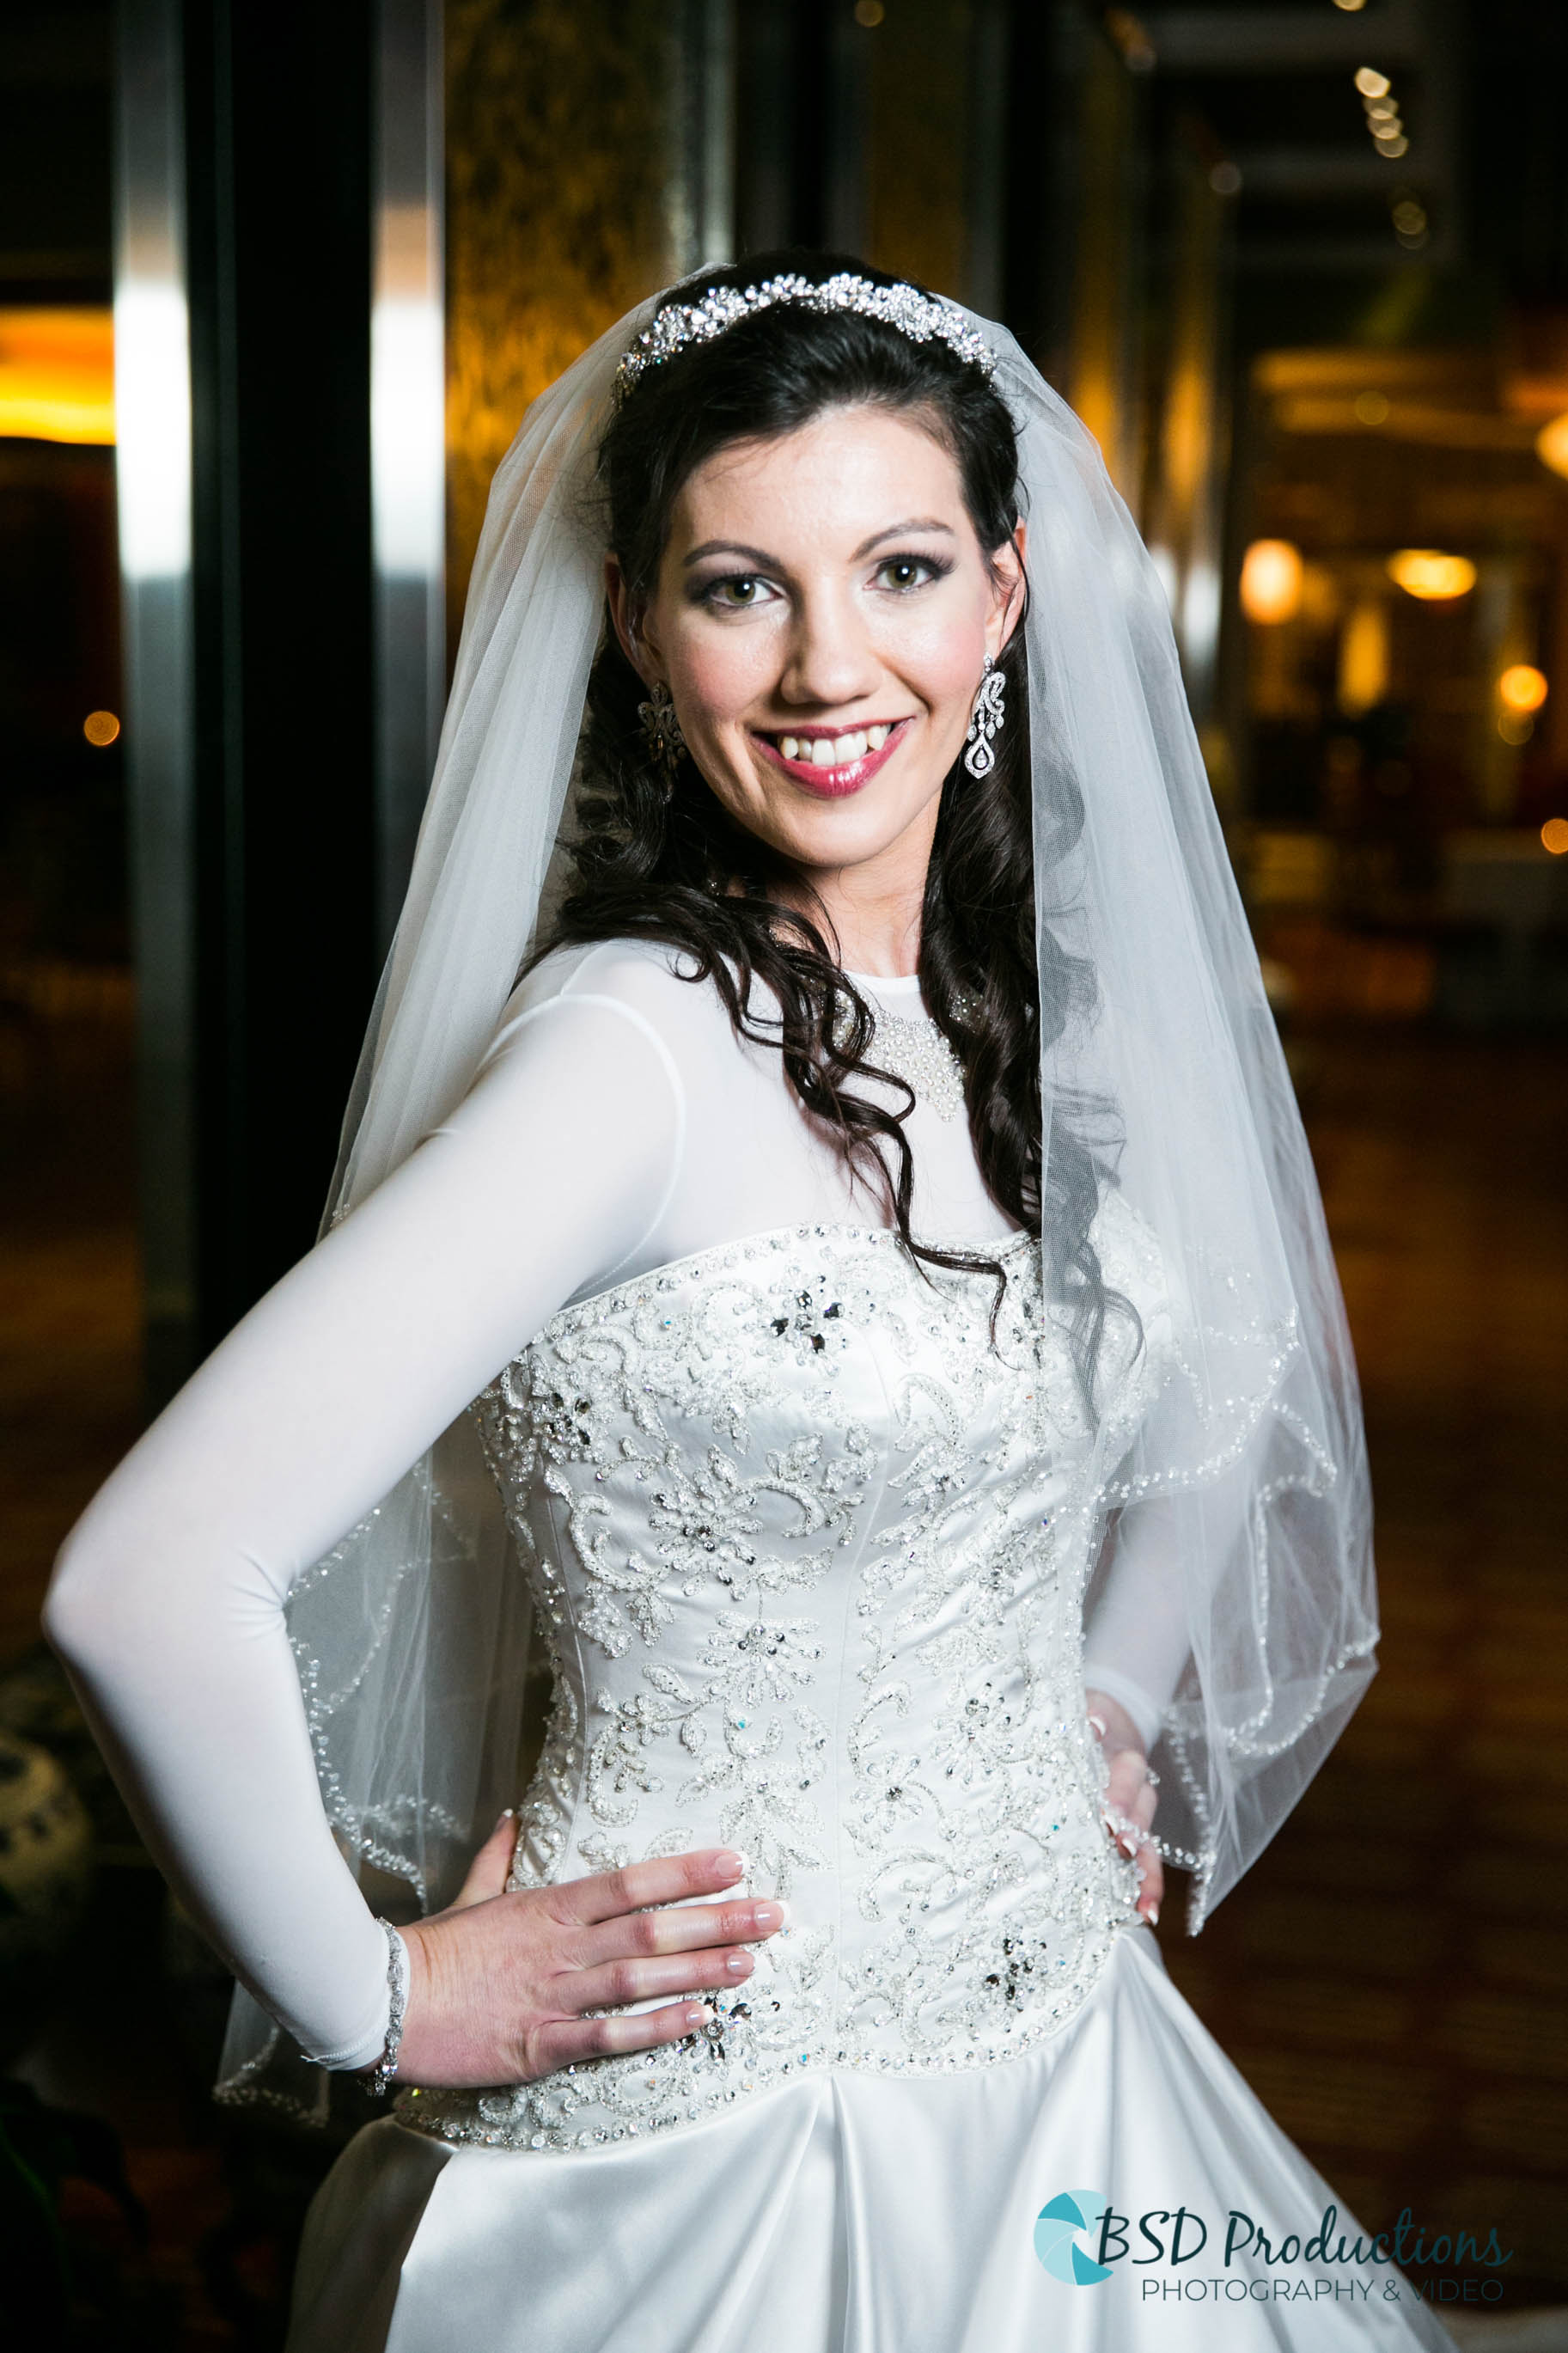 D_R_9888 Wedding – BSD Productions Photography